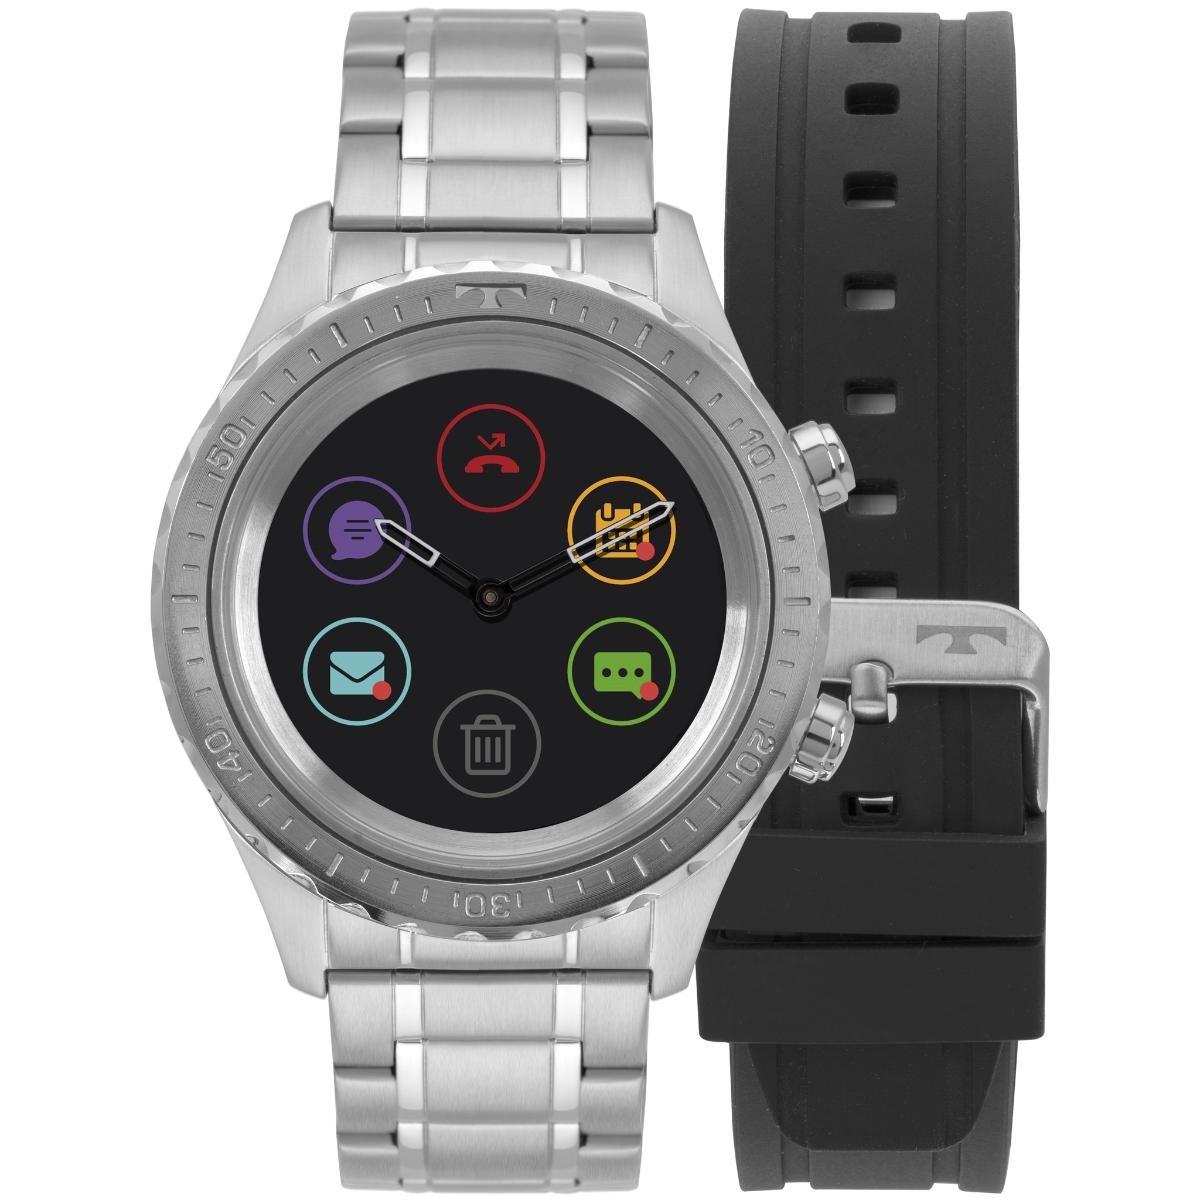 52b0eaa563c63 Relógio Masculino Technos Connect Smartwatch P01aa 1p Prata - R ...